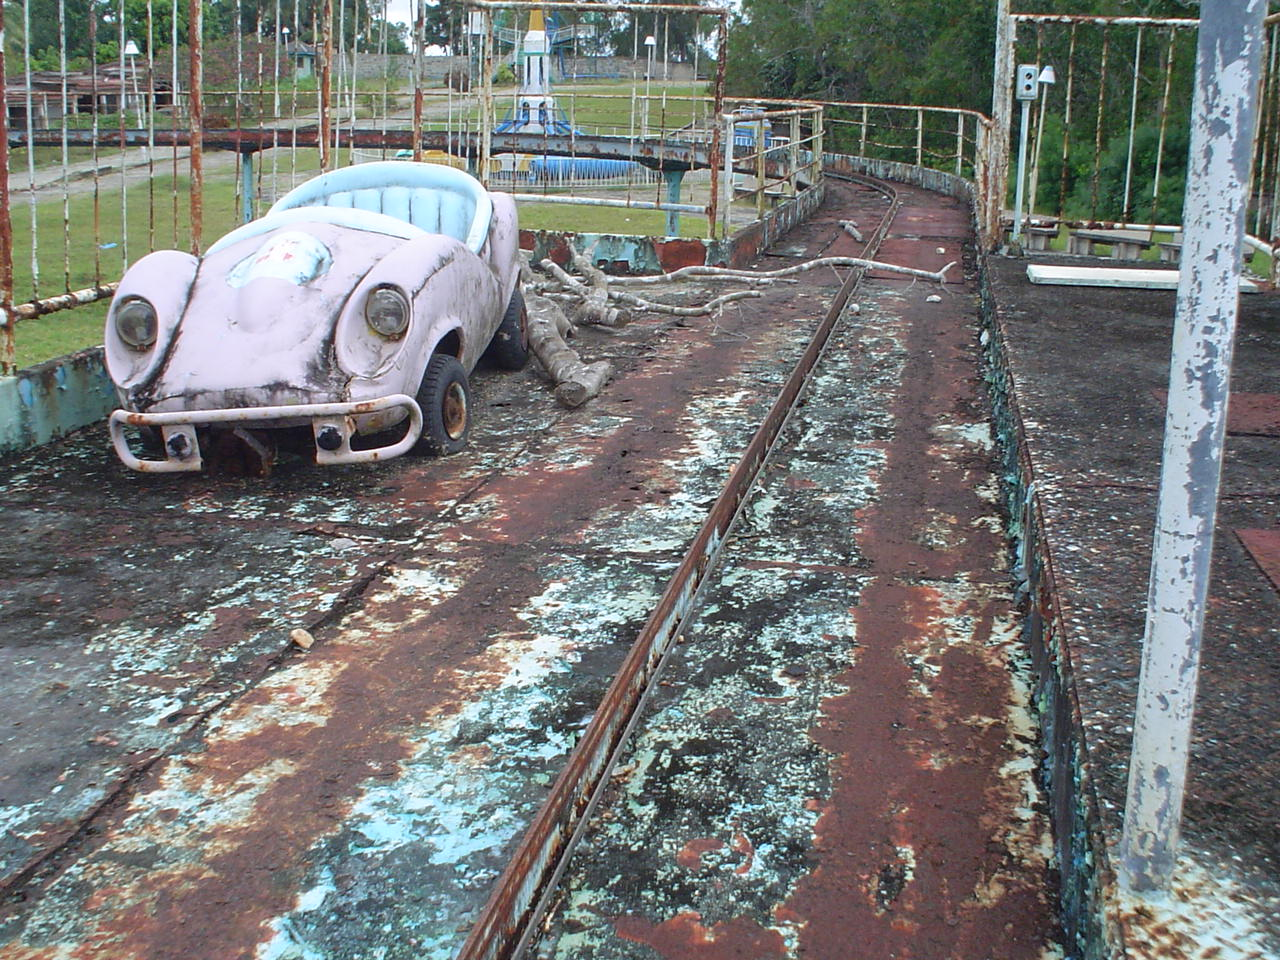 FileDerelict Amusement Park In Pemba TanzaniaJPG Wikimedia Commons